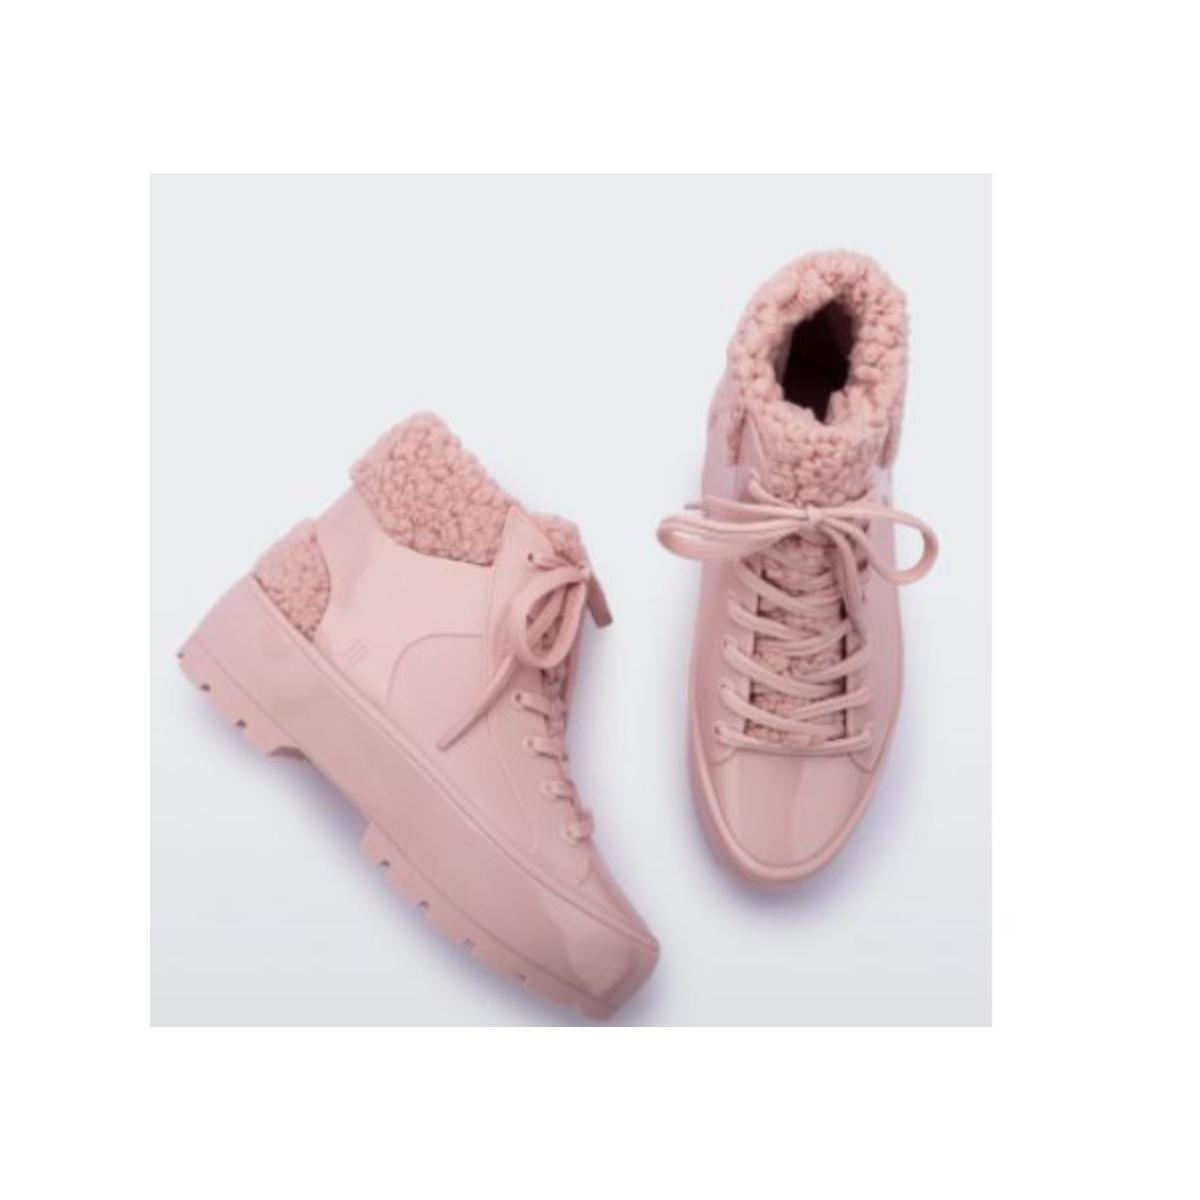 Bota Feminina Melissa 33318 16476 Fluffy Sneaker Rosa